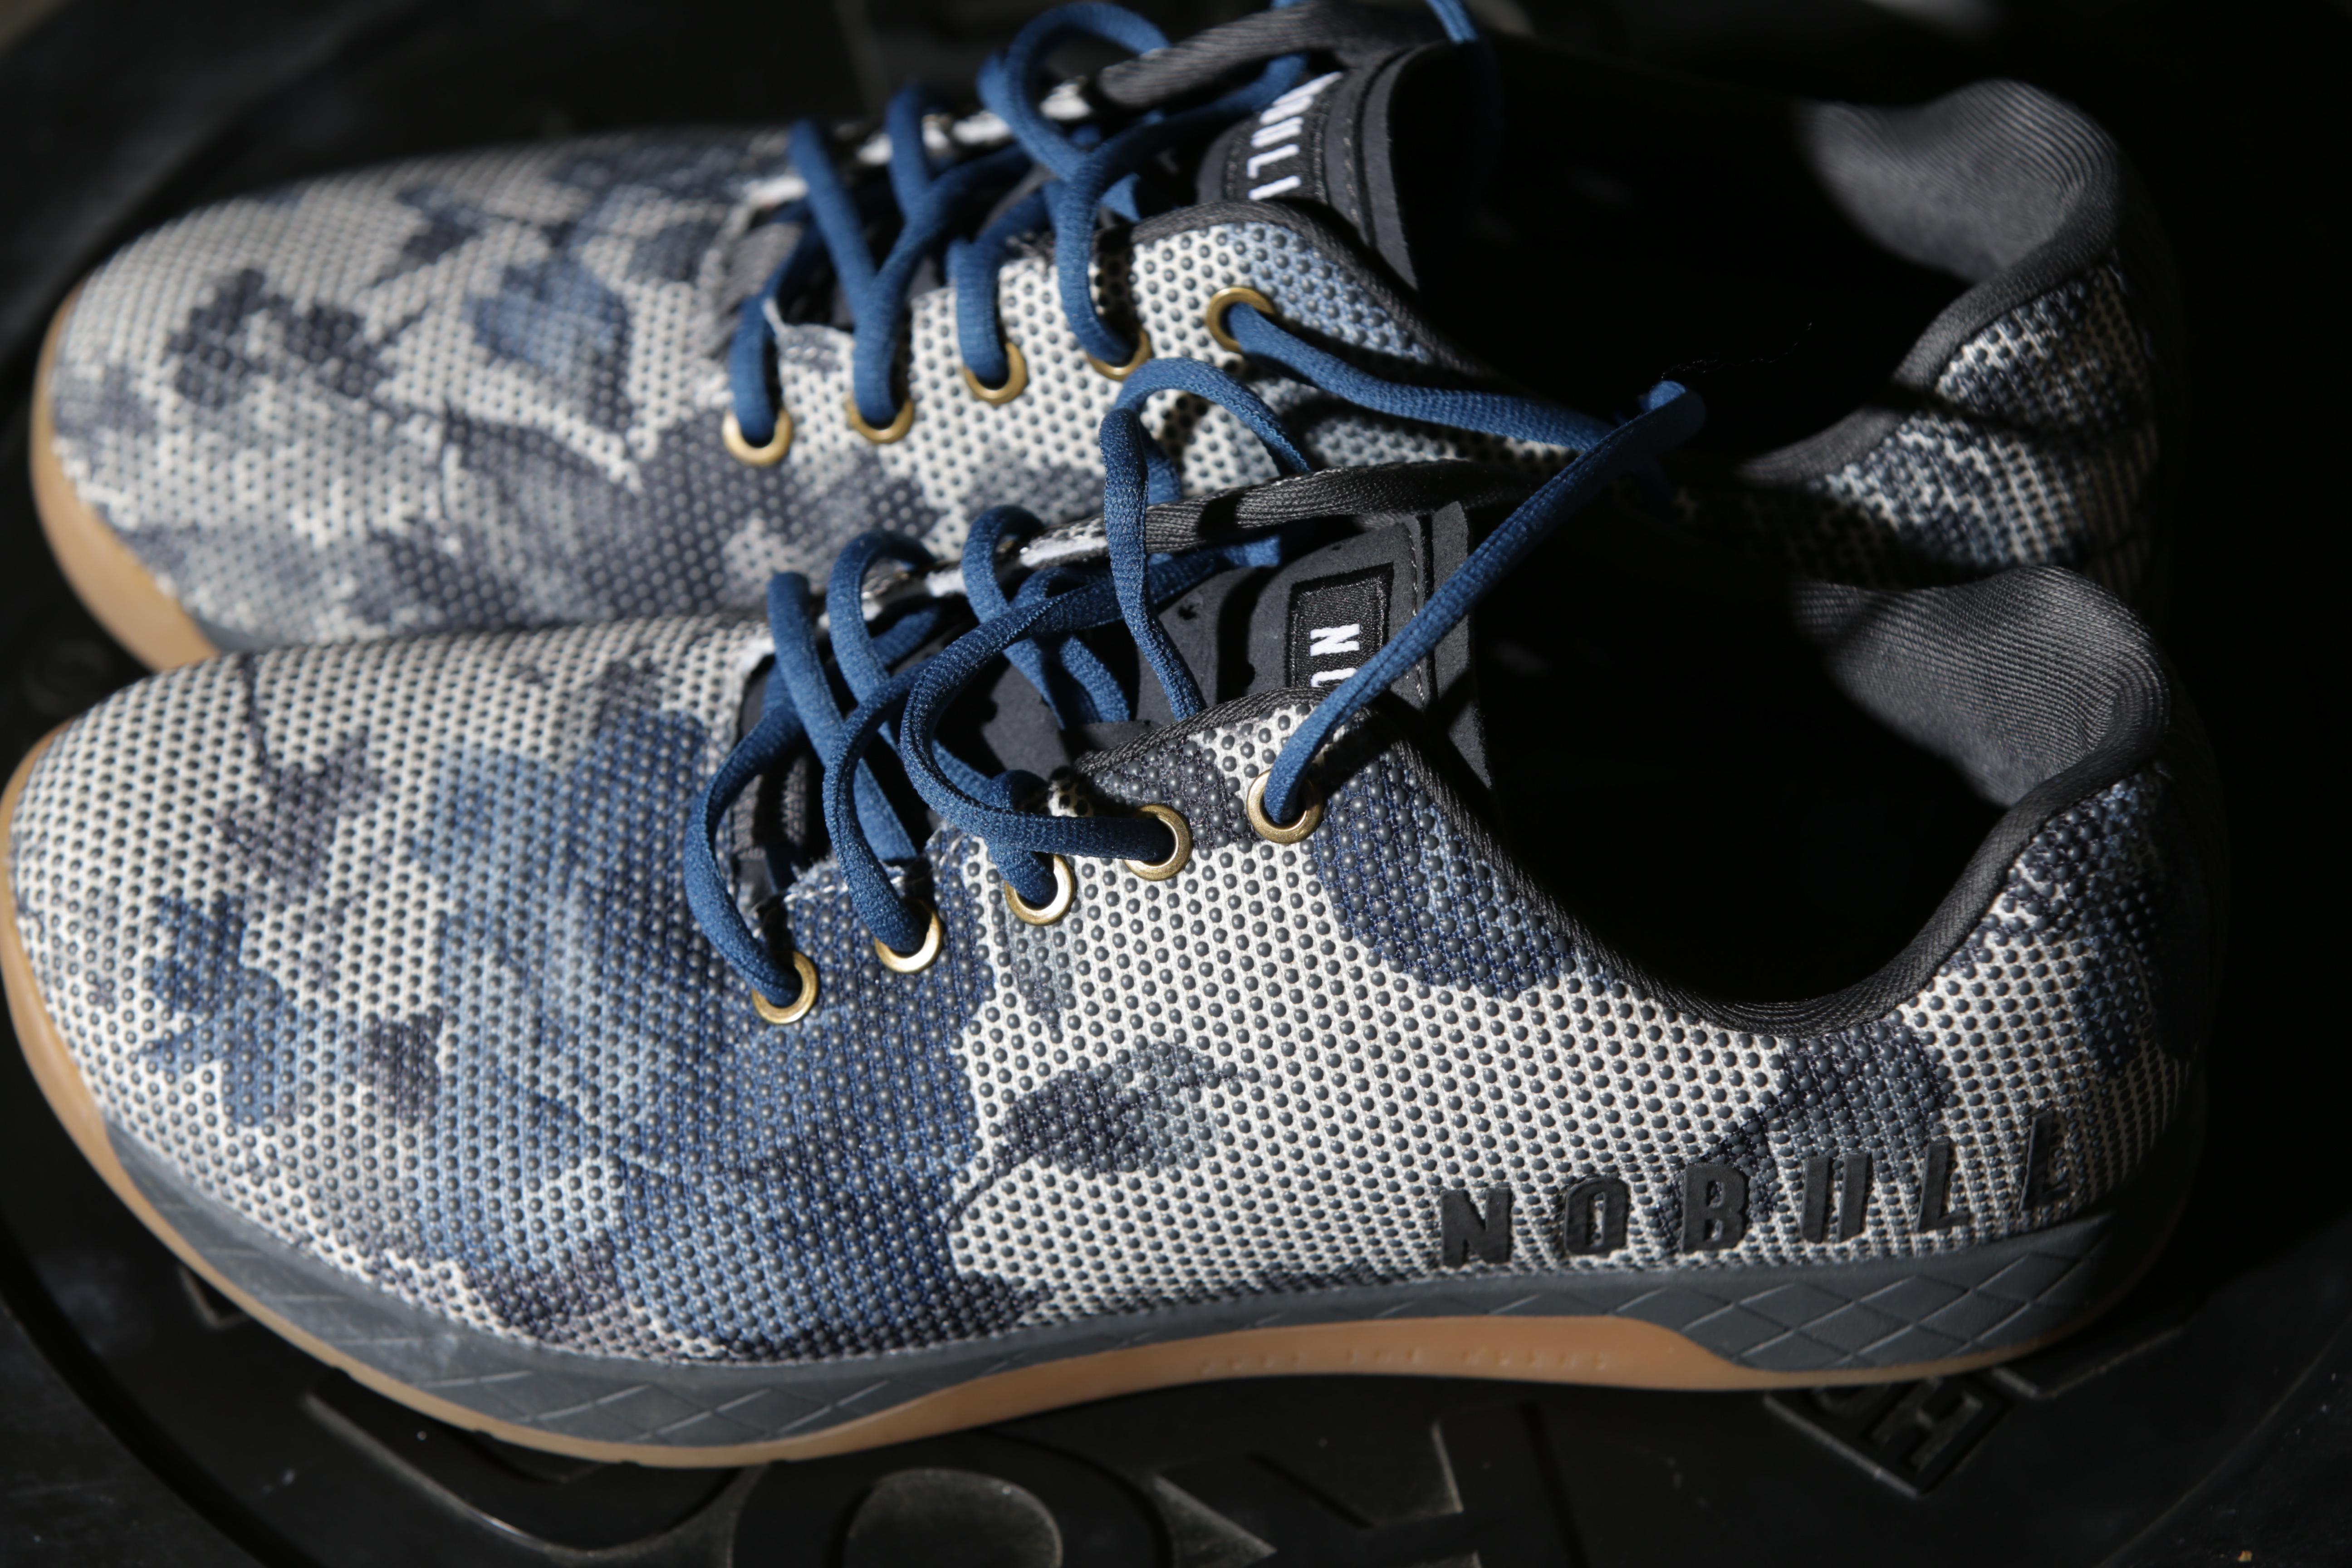 A pair of Nobull sneakers.